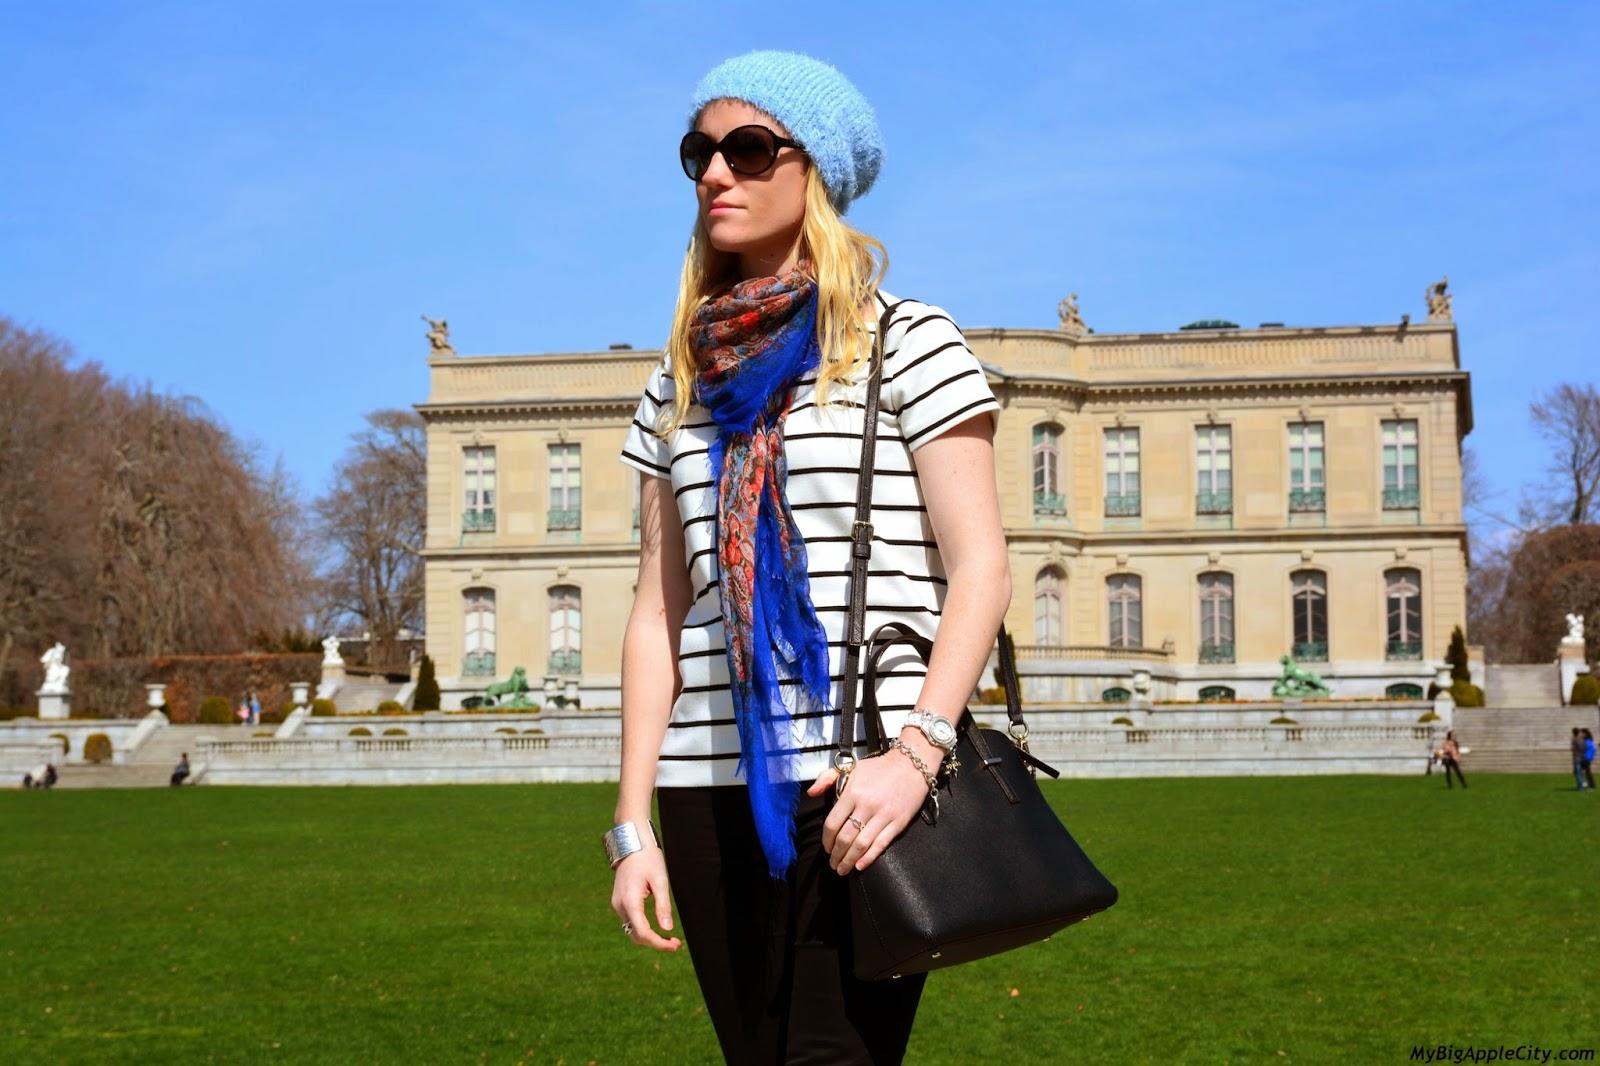 travel-blogger-style-ootd-mybigapplecity